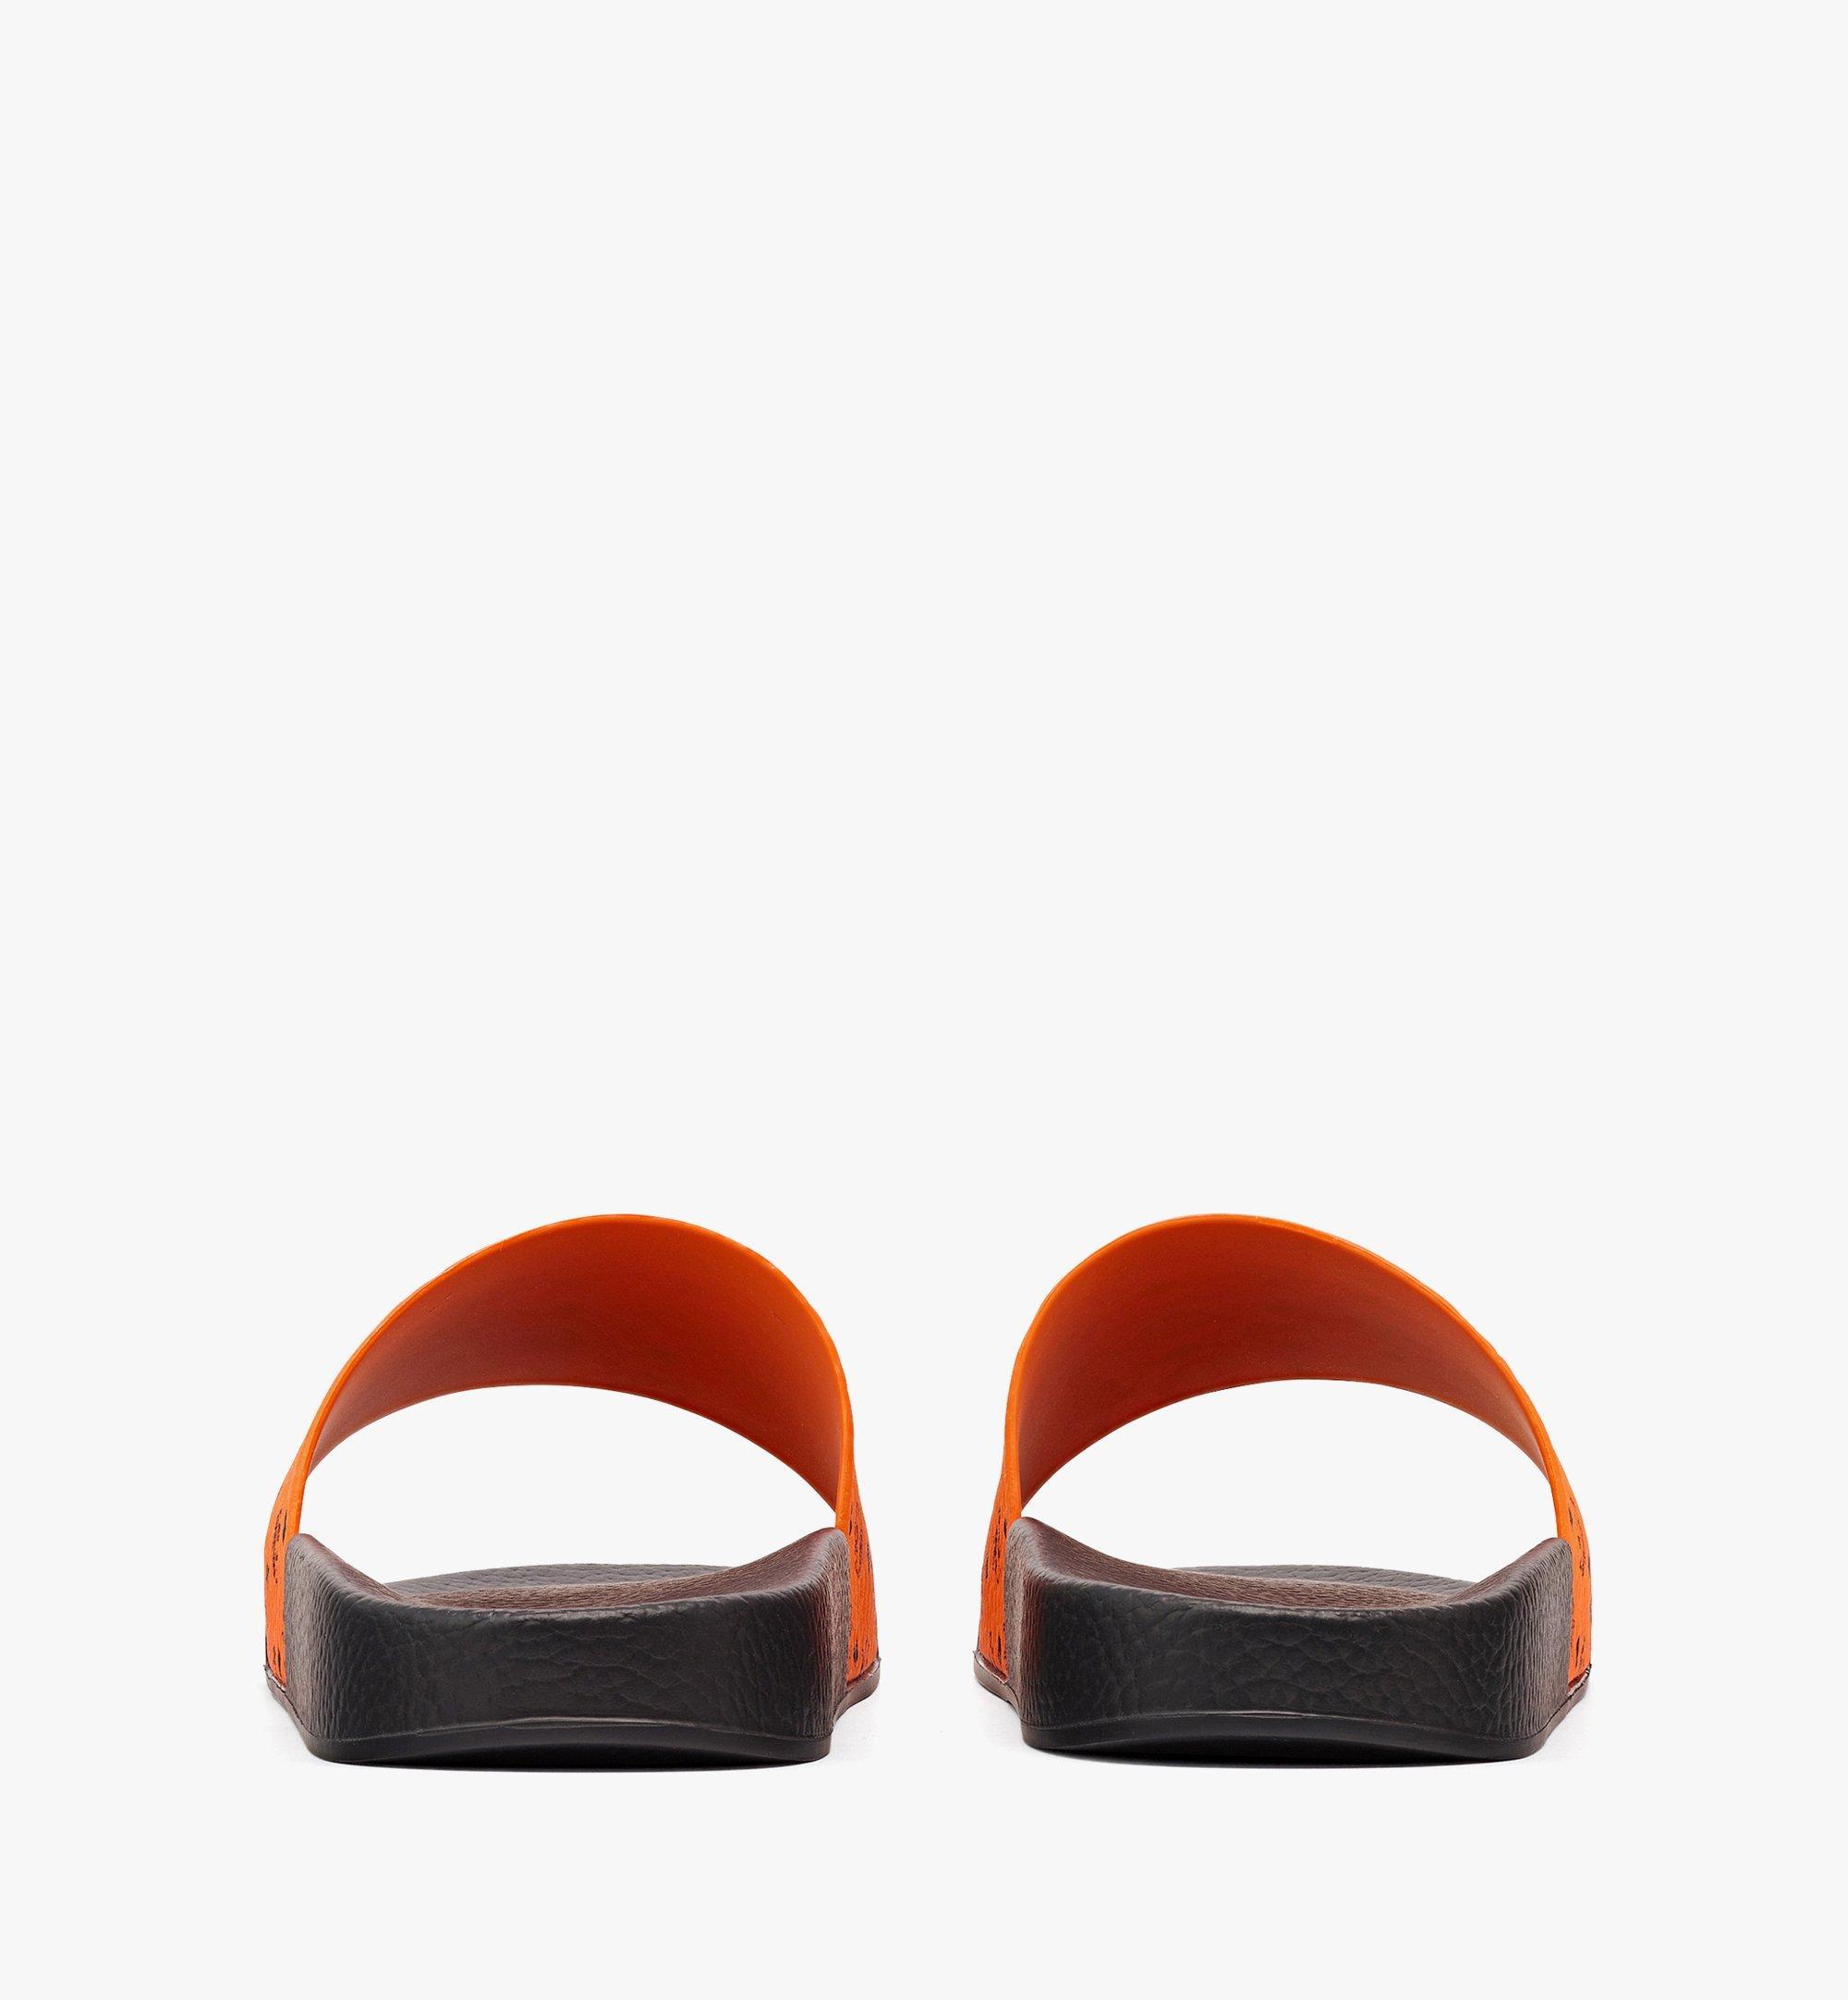 MCM 남성용 비세토스 러버 슬라이드 Orange MEX8AMM60O9041 다른 각도 보기 2